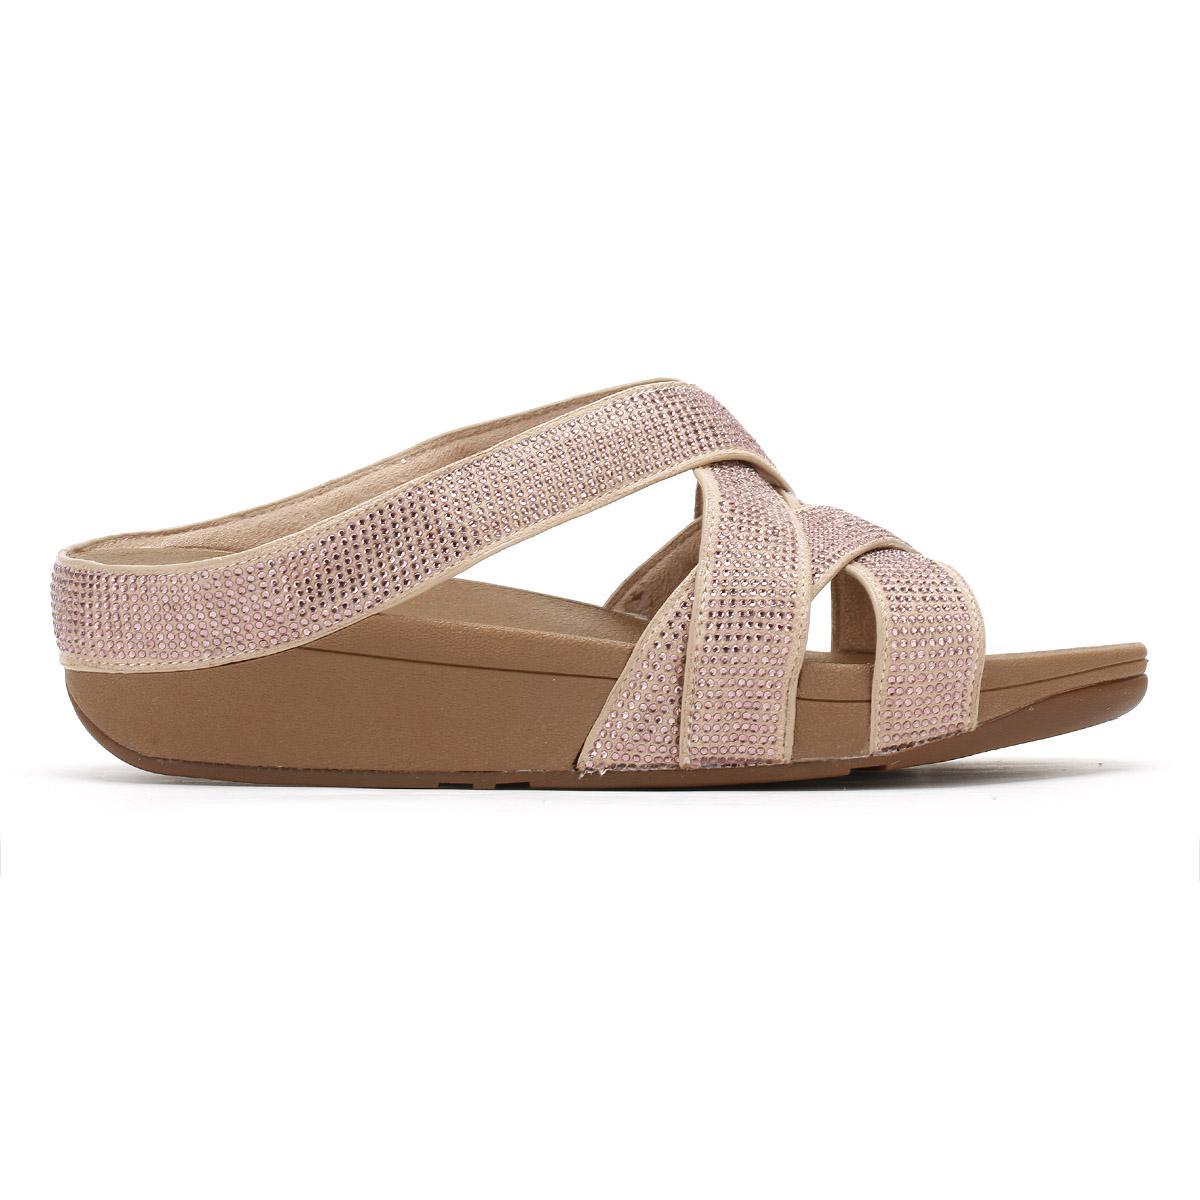 2d0c01686 Lyst - Fitflop Womens Nude Slinky Rokkit Criss-cross Sandals